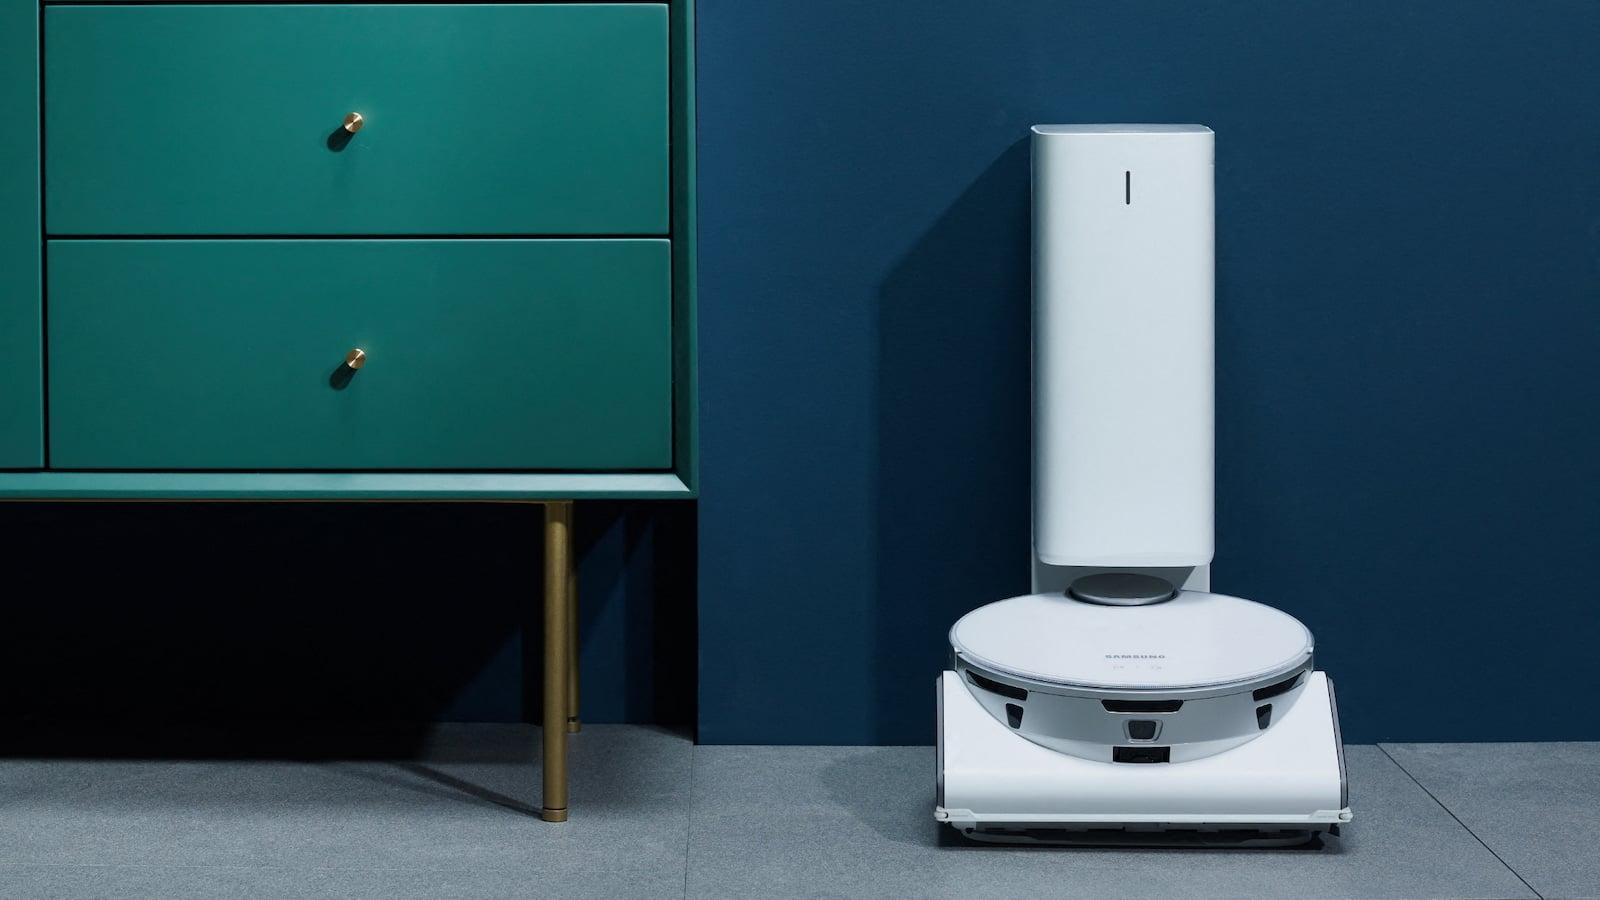 Samsung JetBot 90 AI+ robotic vacuum